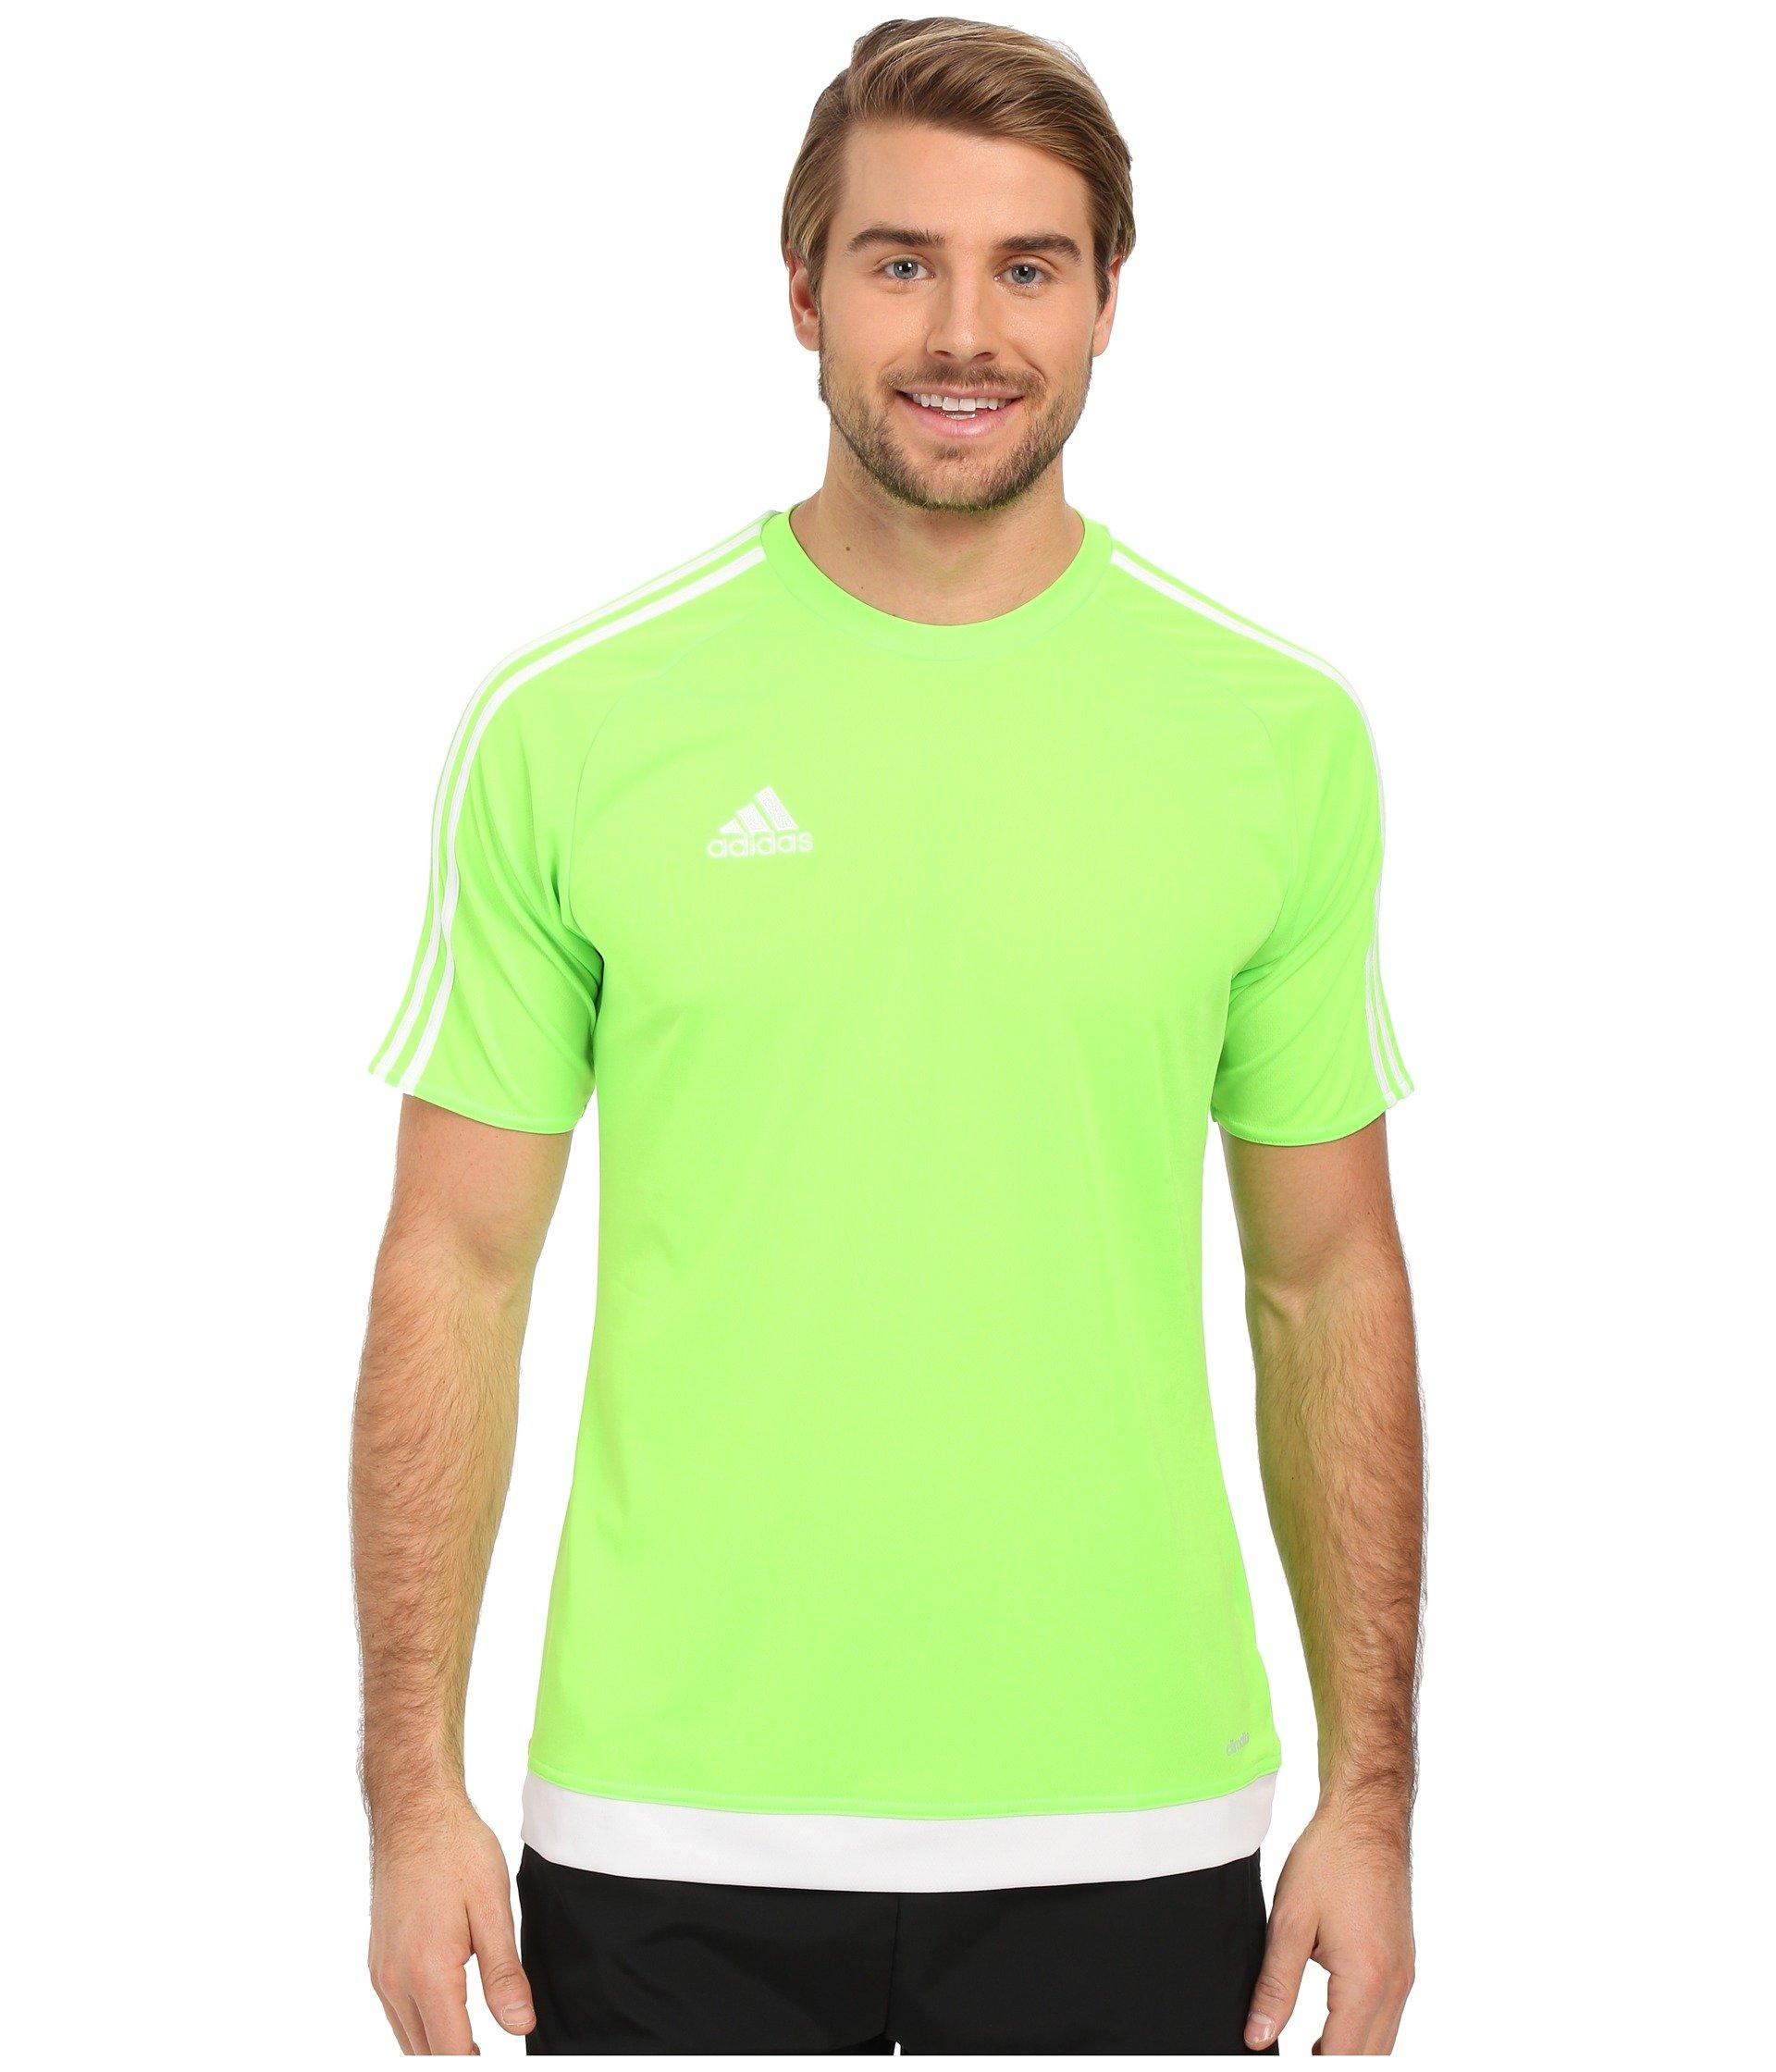 c7b2b22ea Adidas Boys Estro 15 Jersey T-Shirt Solar Green/White Size Youth Large